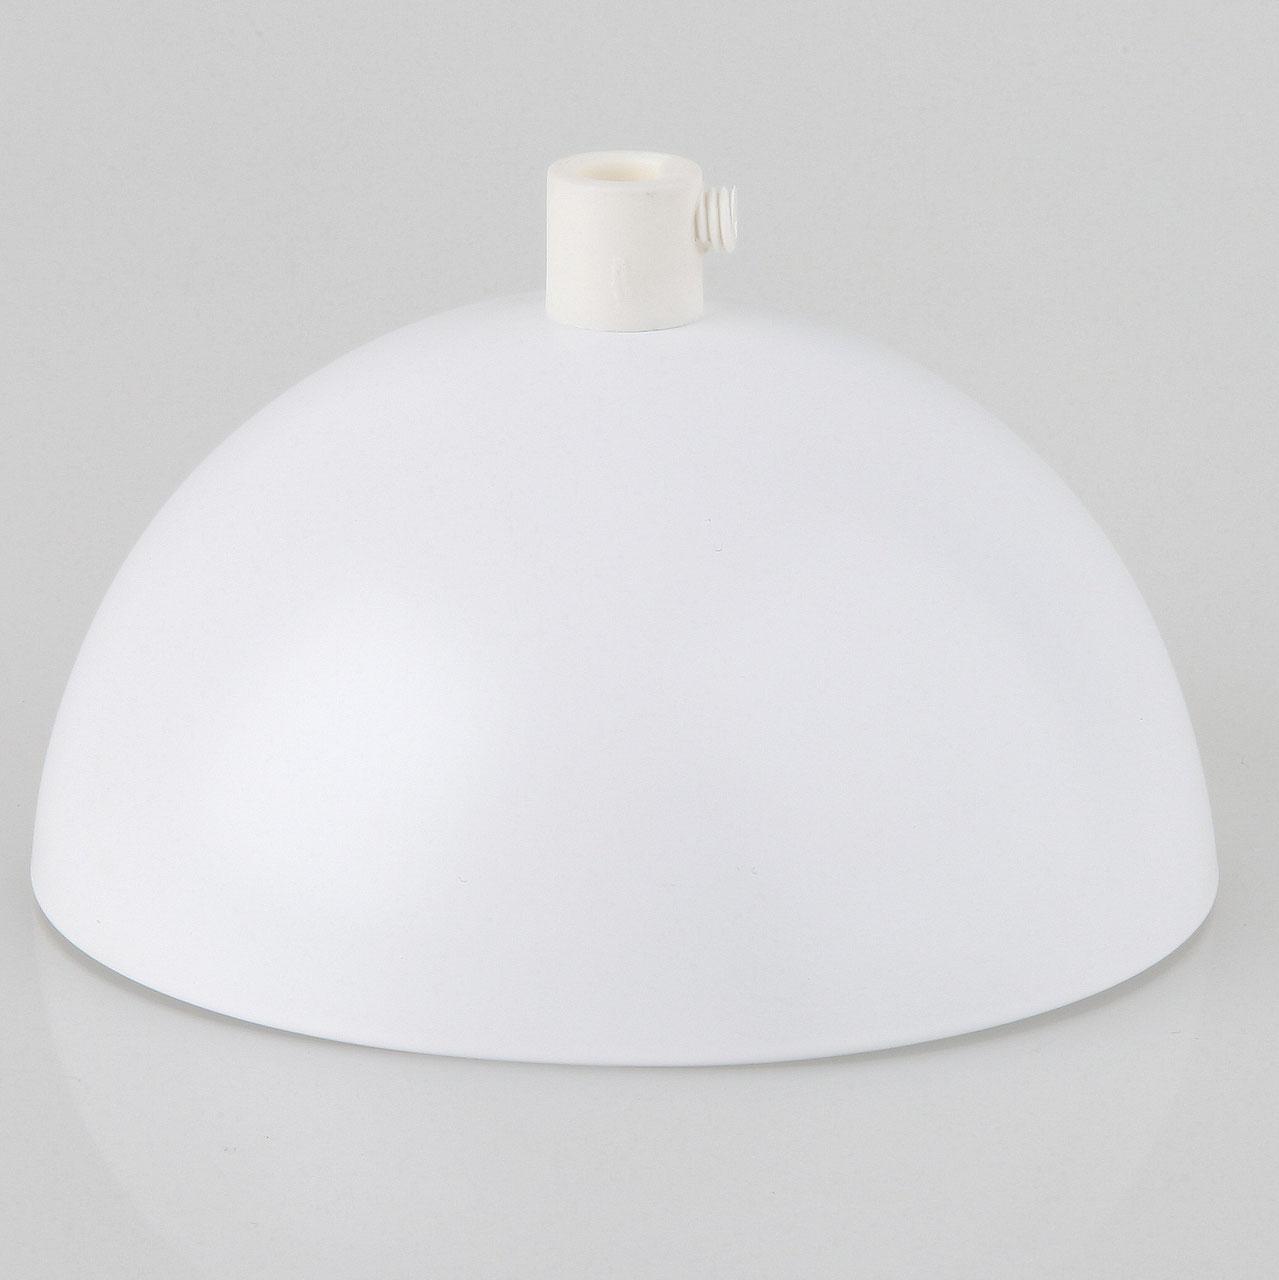 Leuchten baldachine textilkabel fachhandel felix schmieder for Lampen leuchten